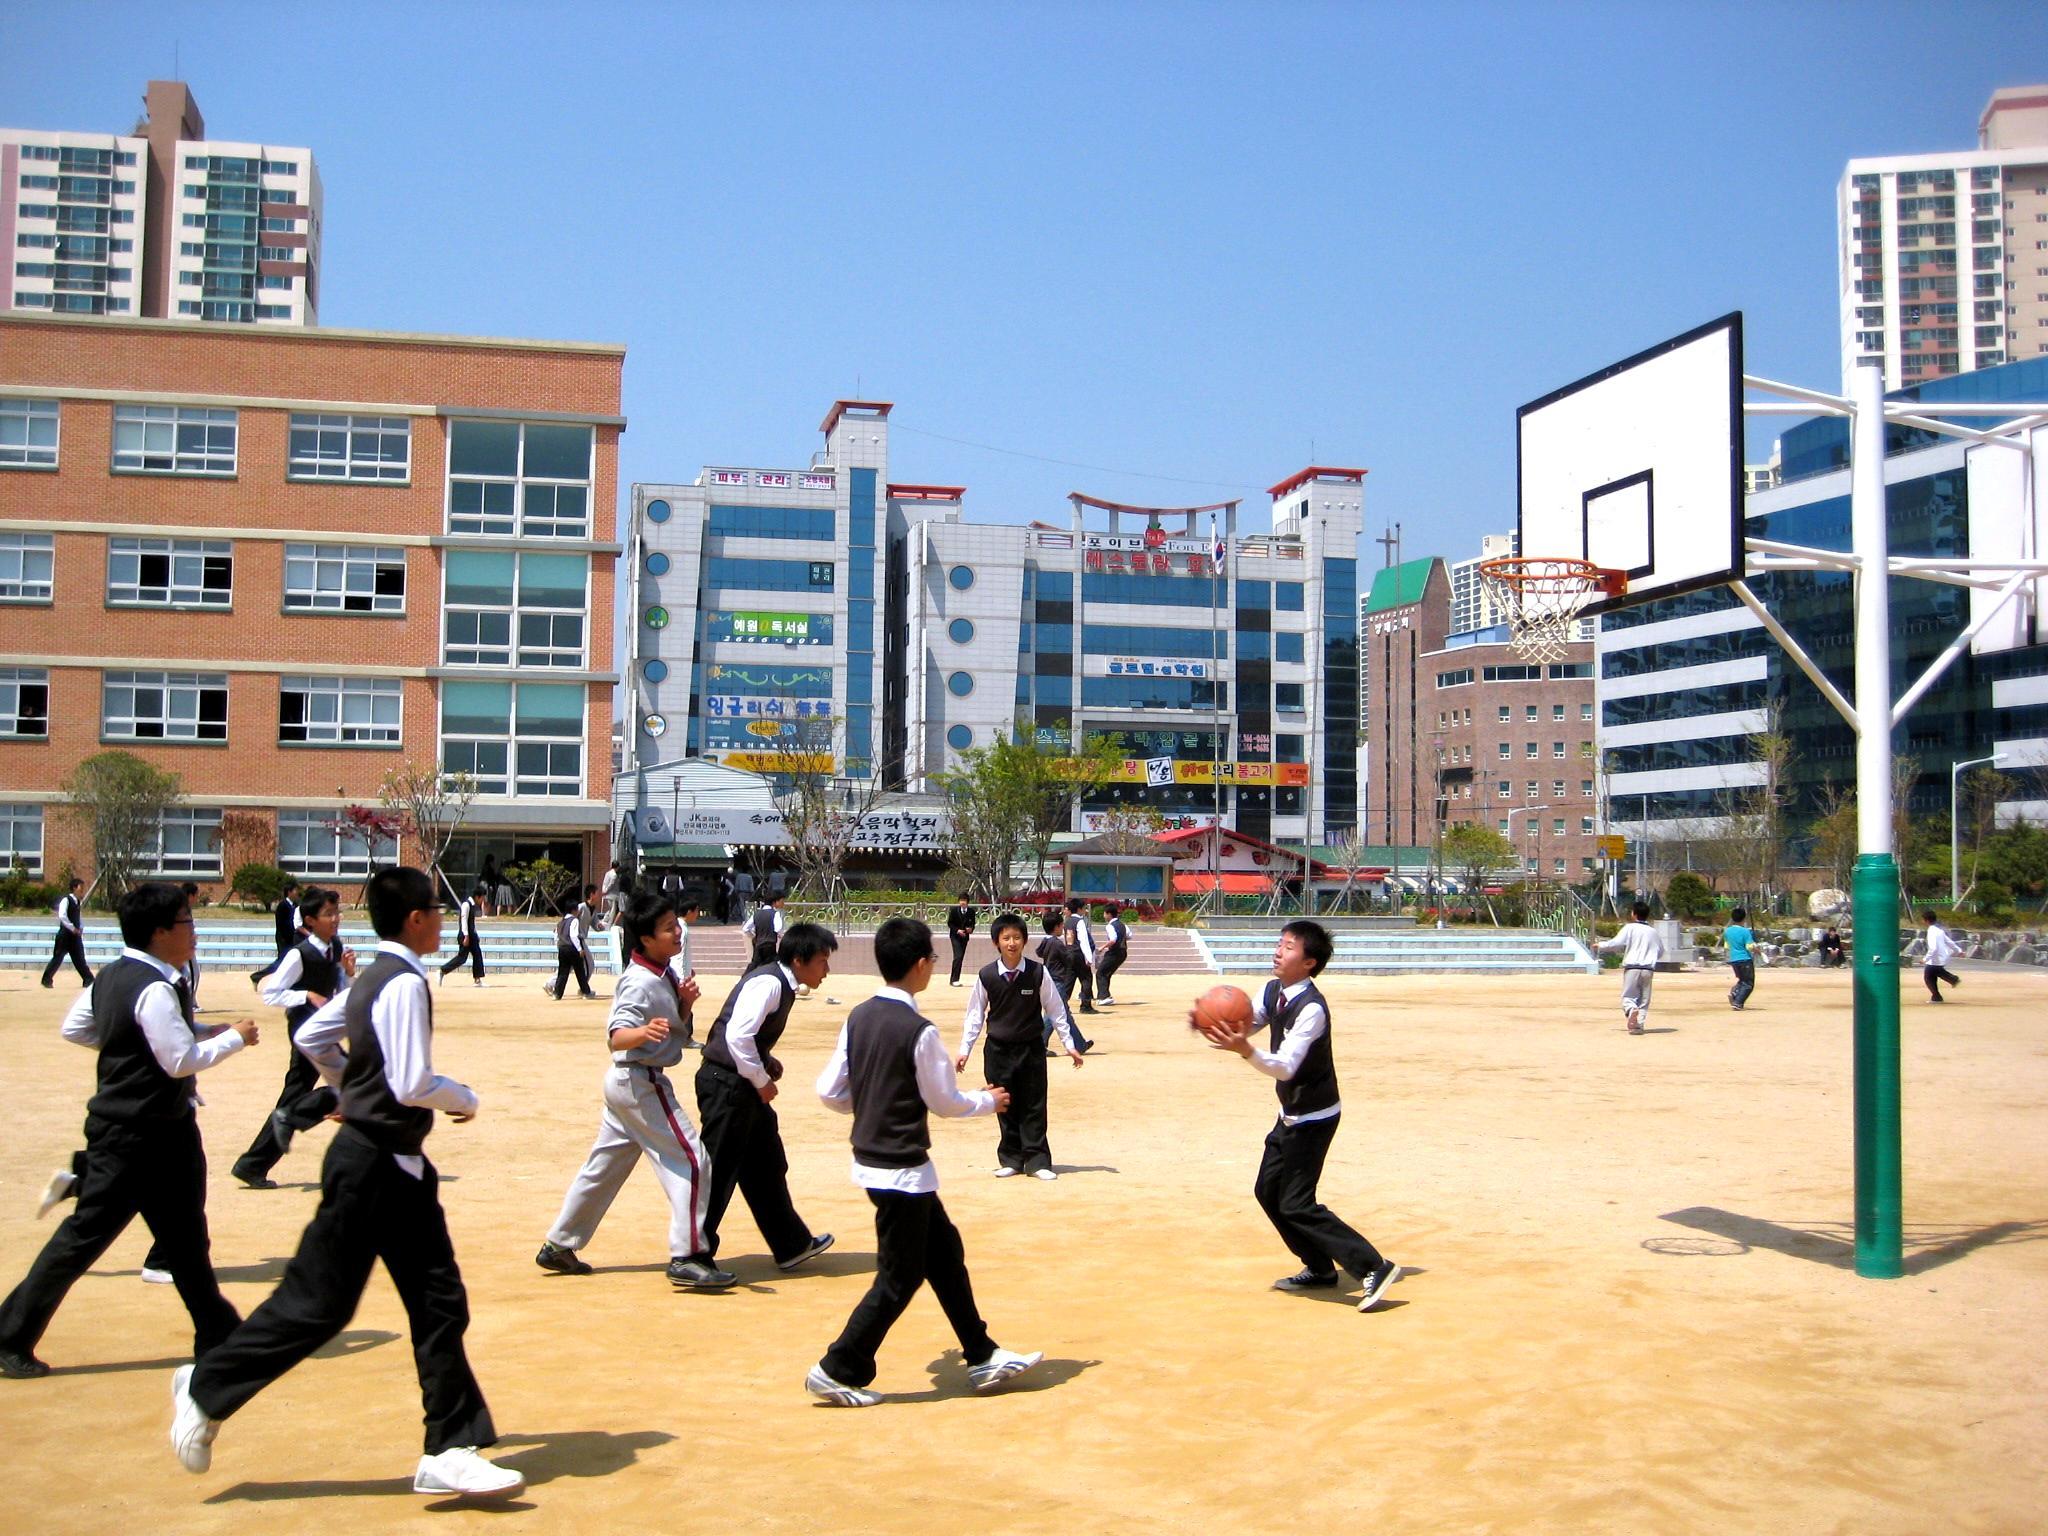 File:Korea-Busan-Doosong Middle School-02.jpg - Wikimedia ...